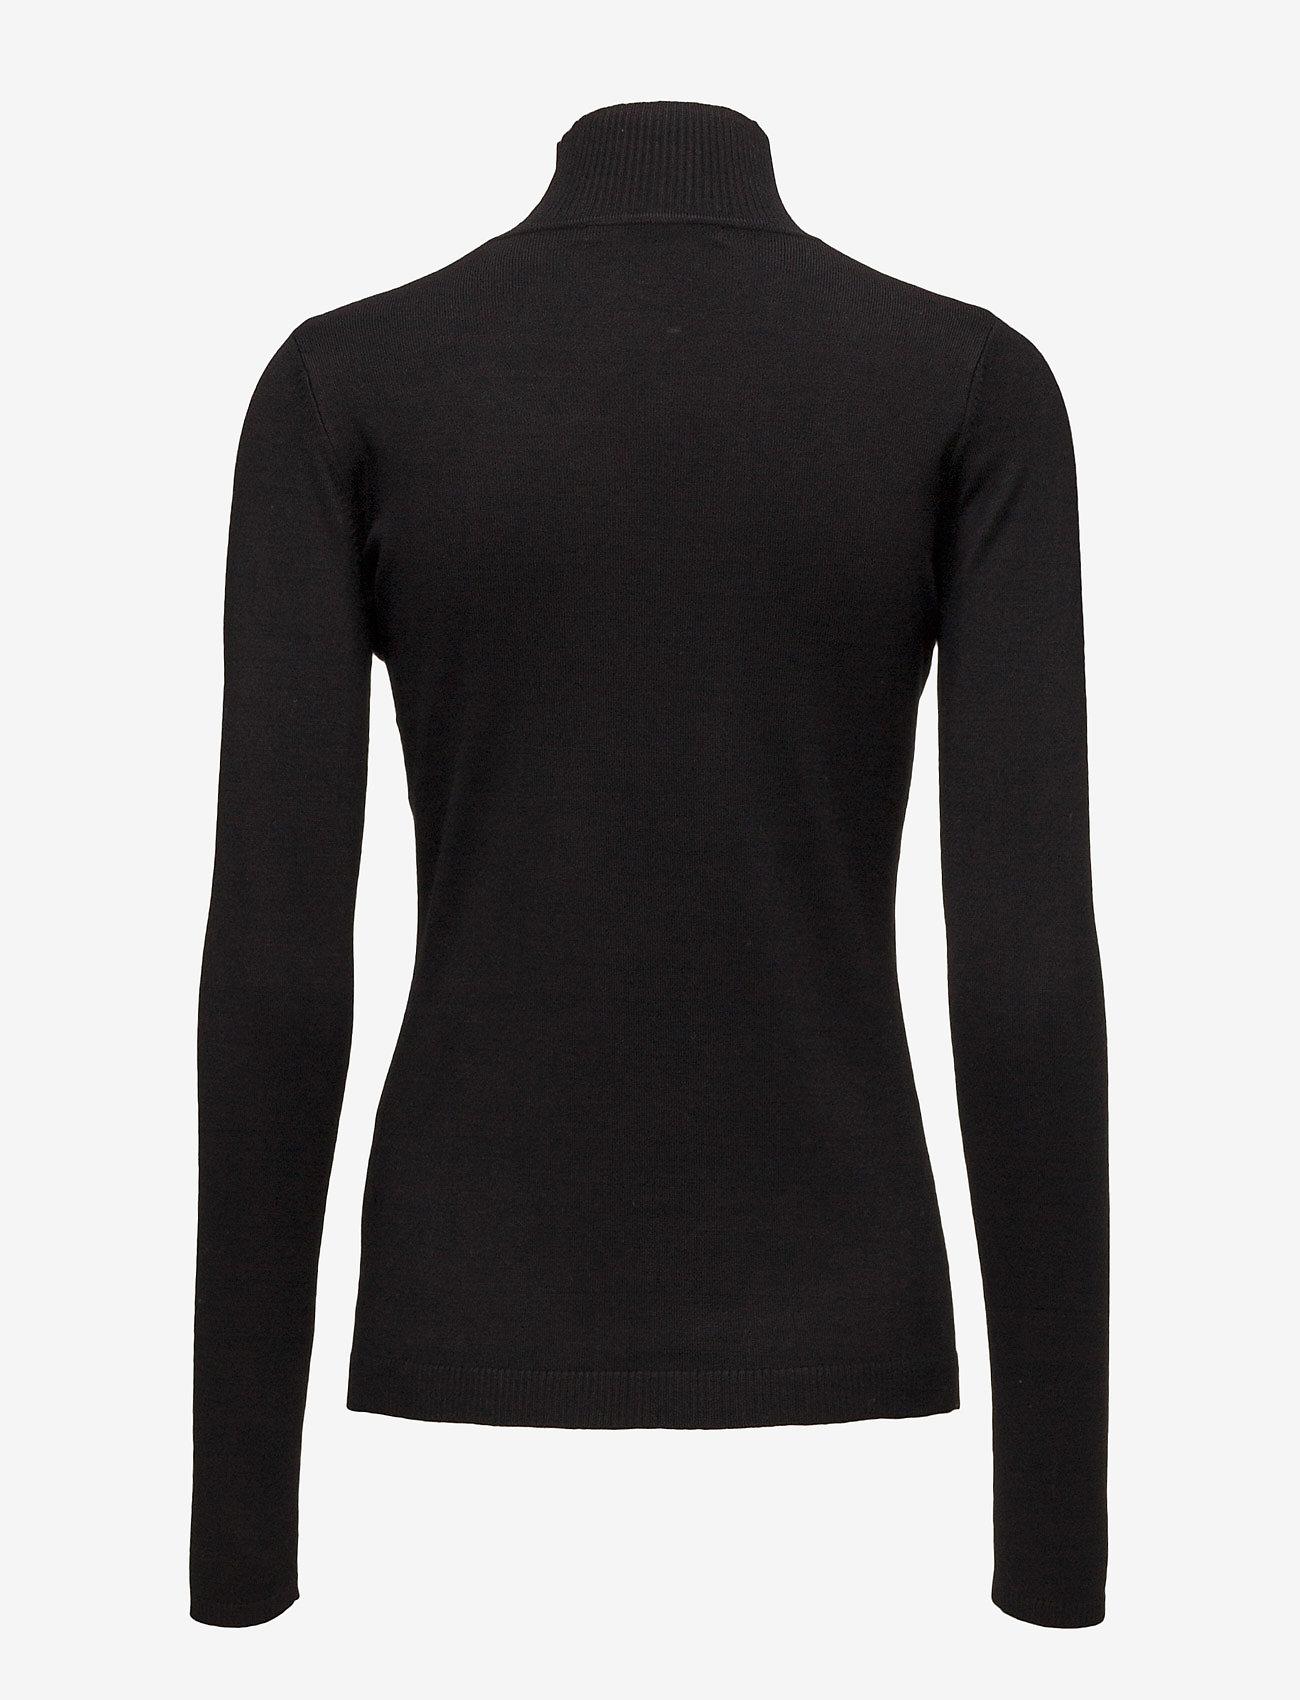 Minus - Lana roll neck knit - turtlenecks - black - 1